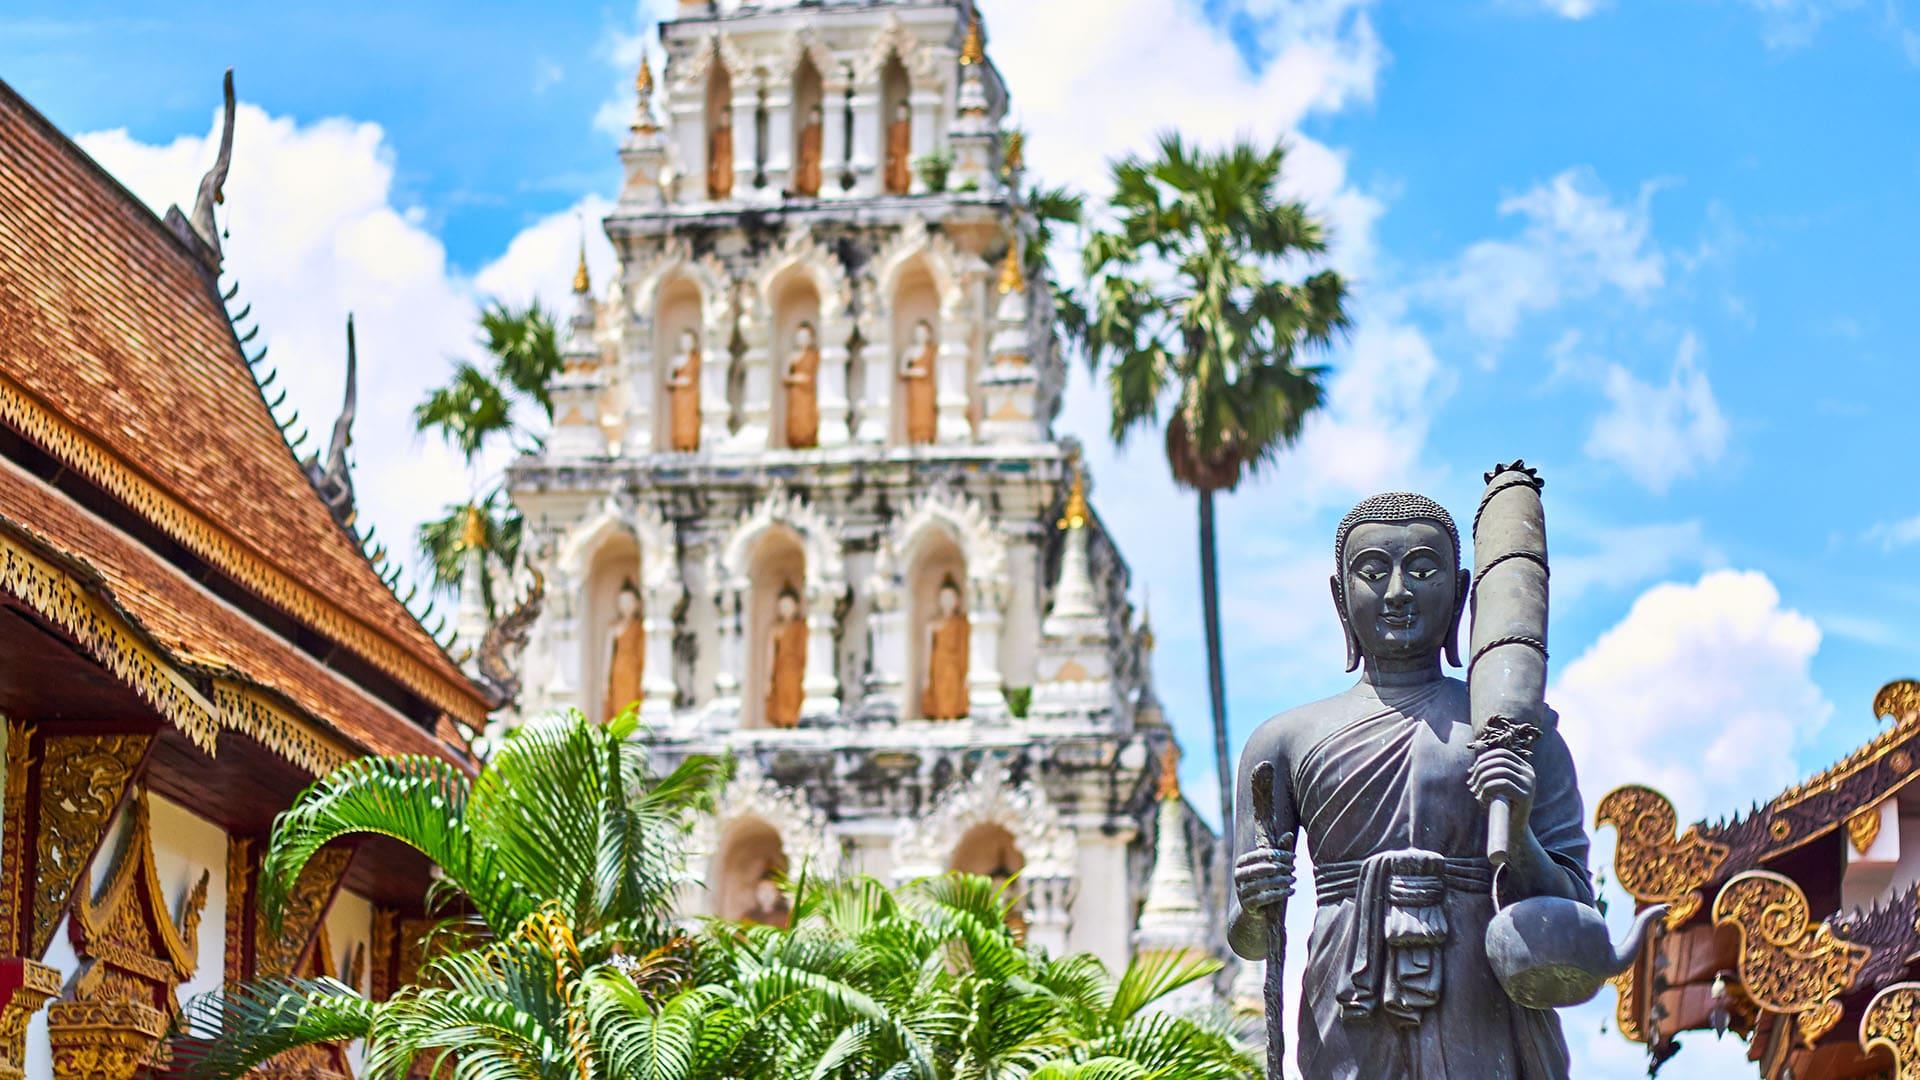 Thailand's beautiful architecture